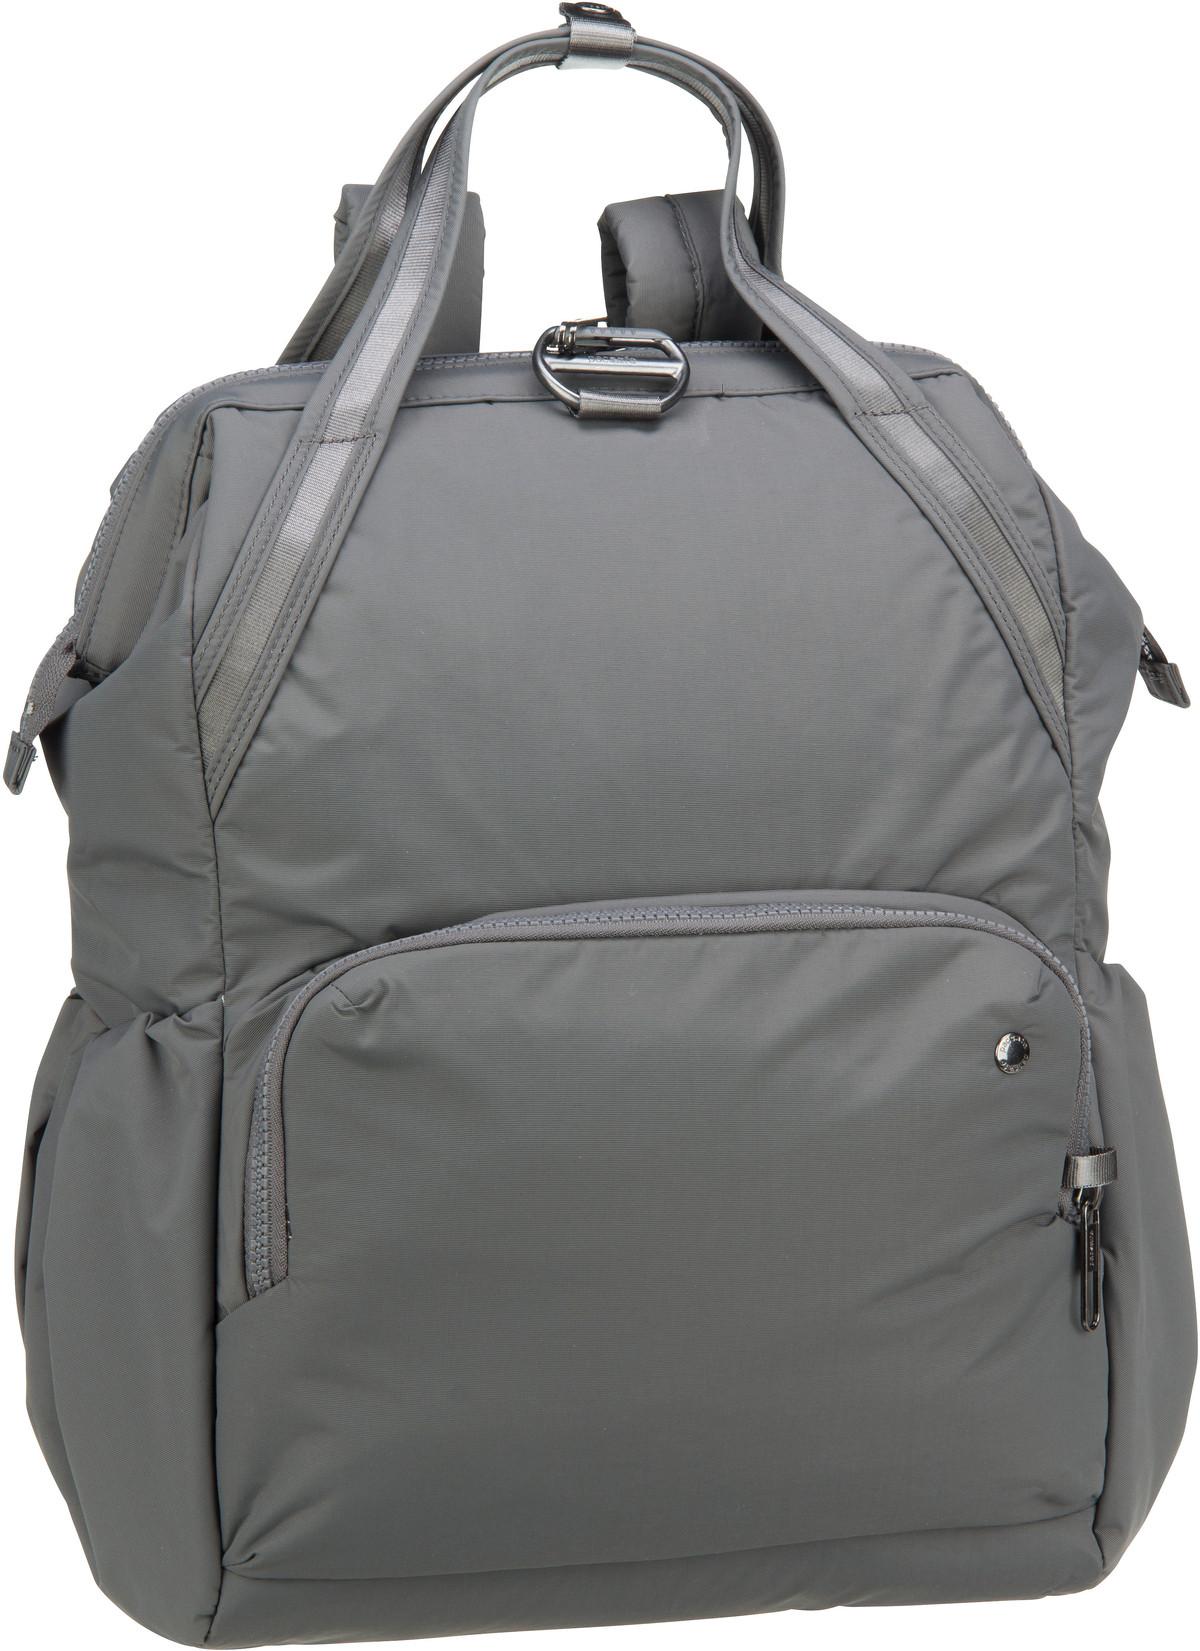 Laptoprucksack Citysafe CX Backpack Econyl Storm (17 Liter)